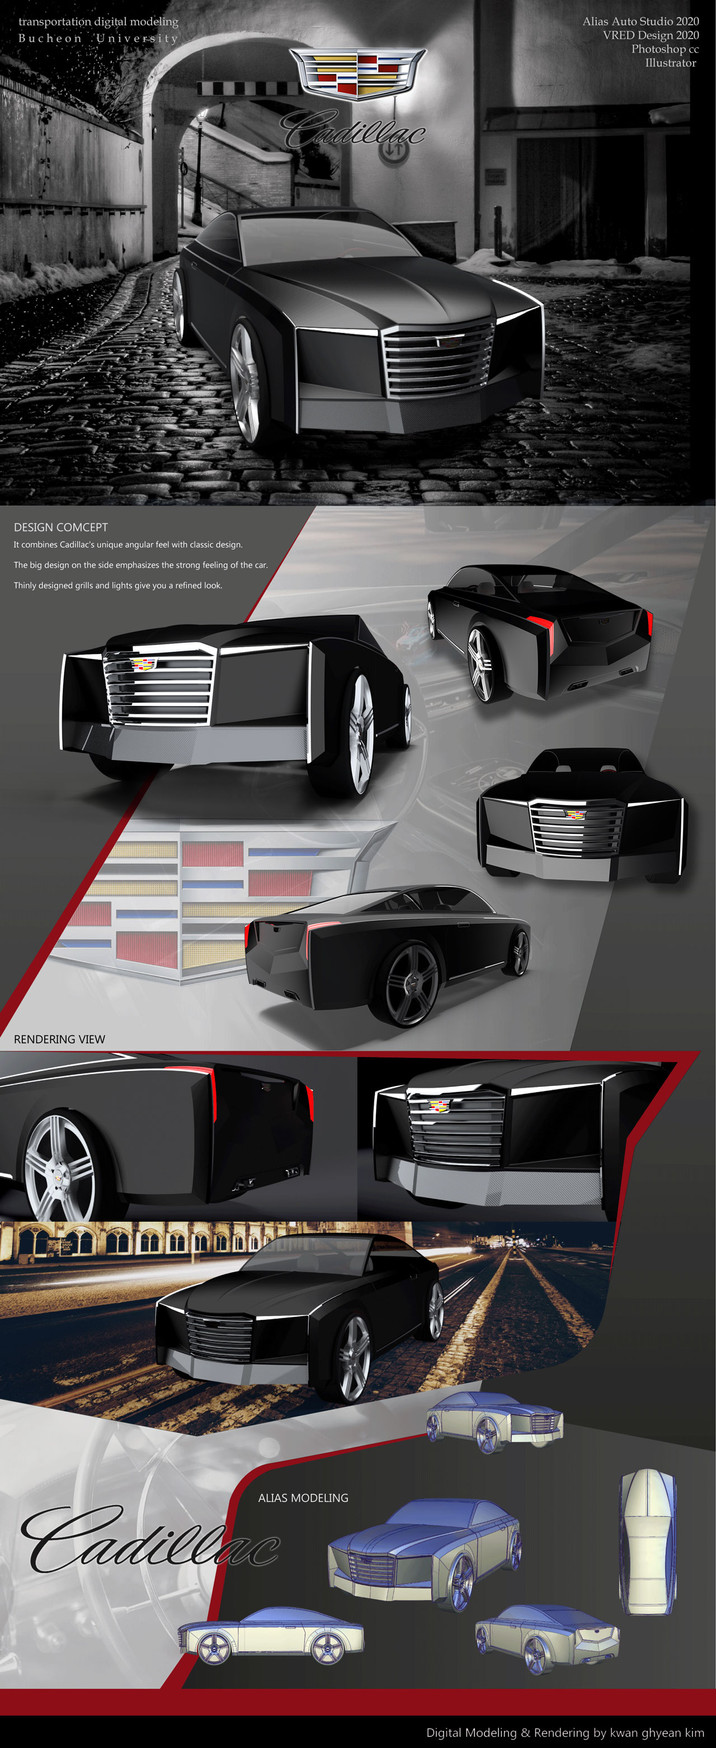 Cadillac Classic Concept Car